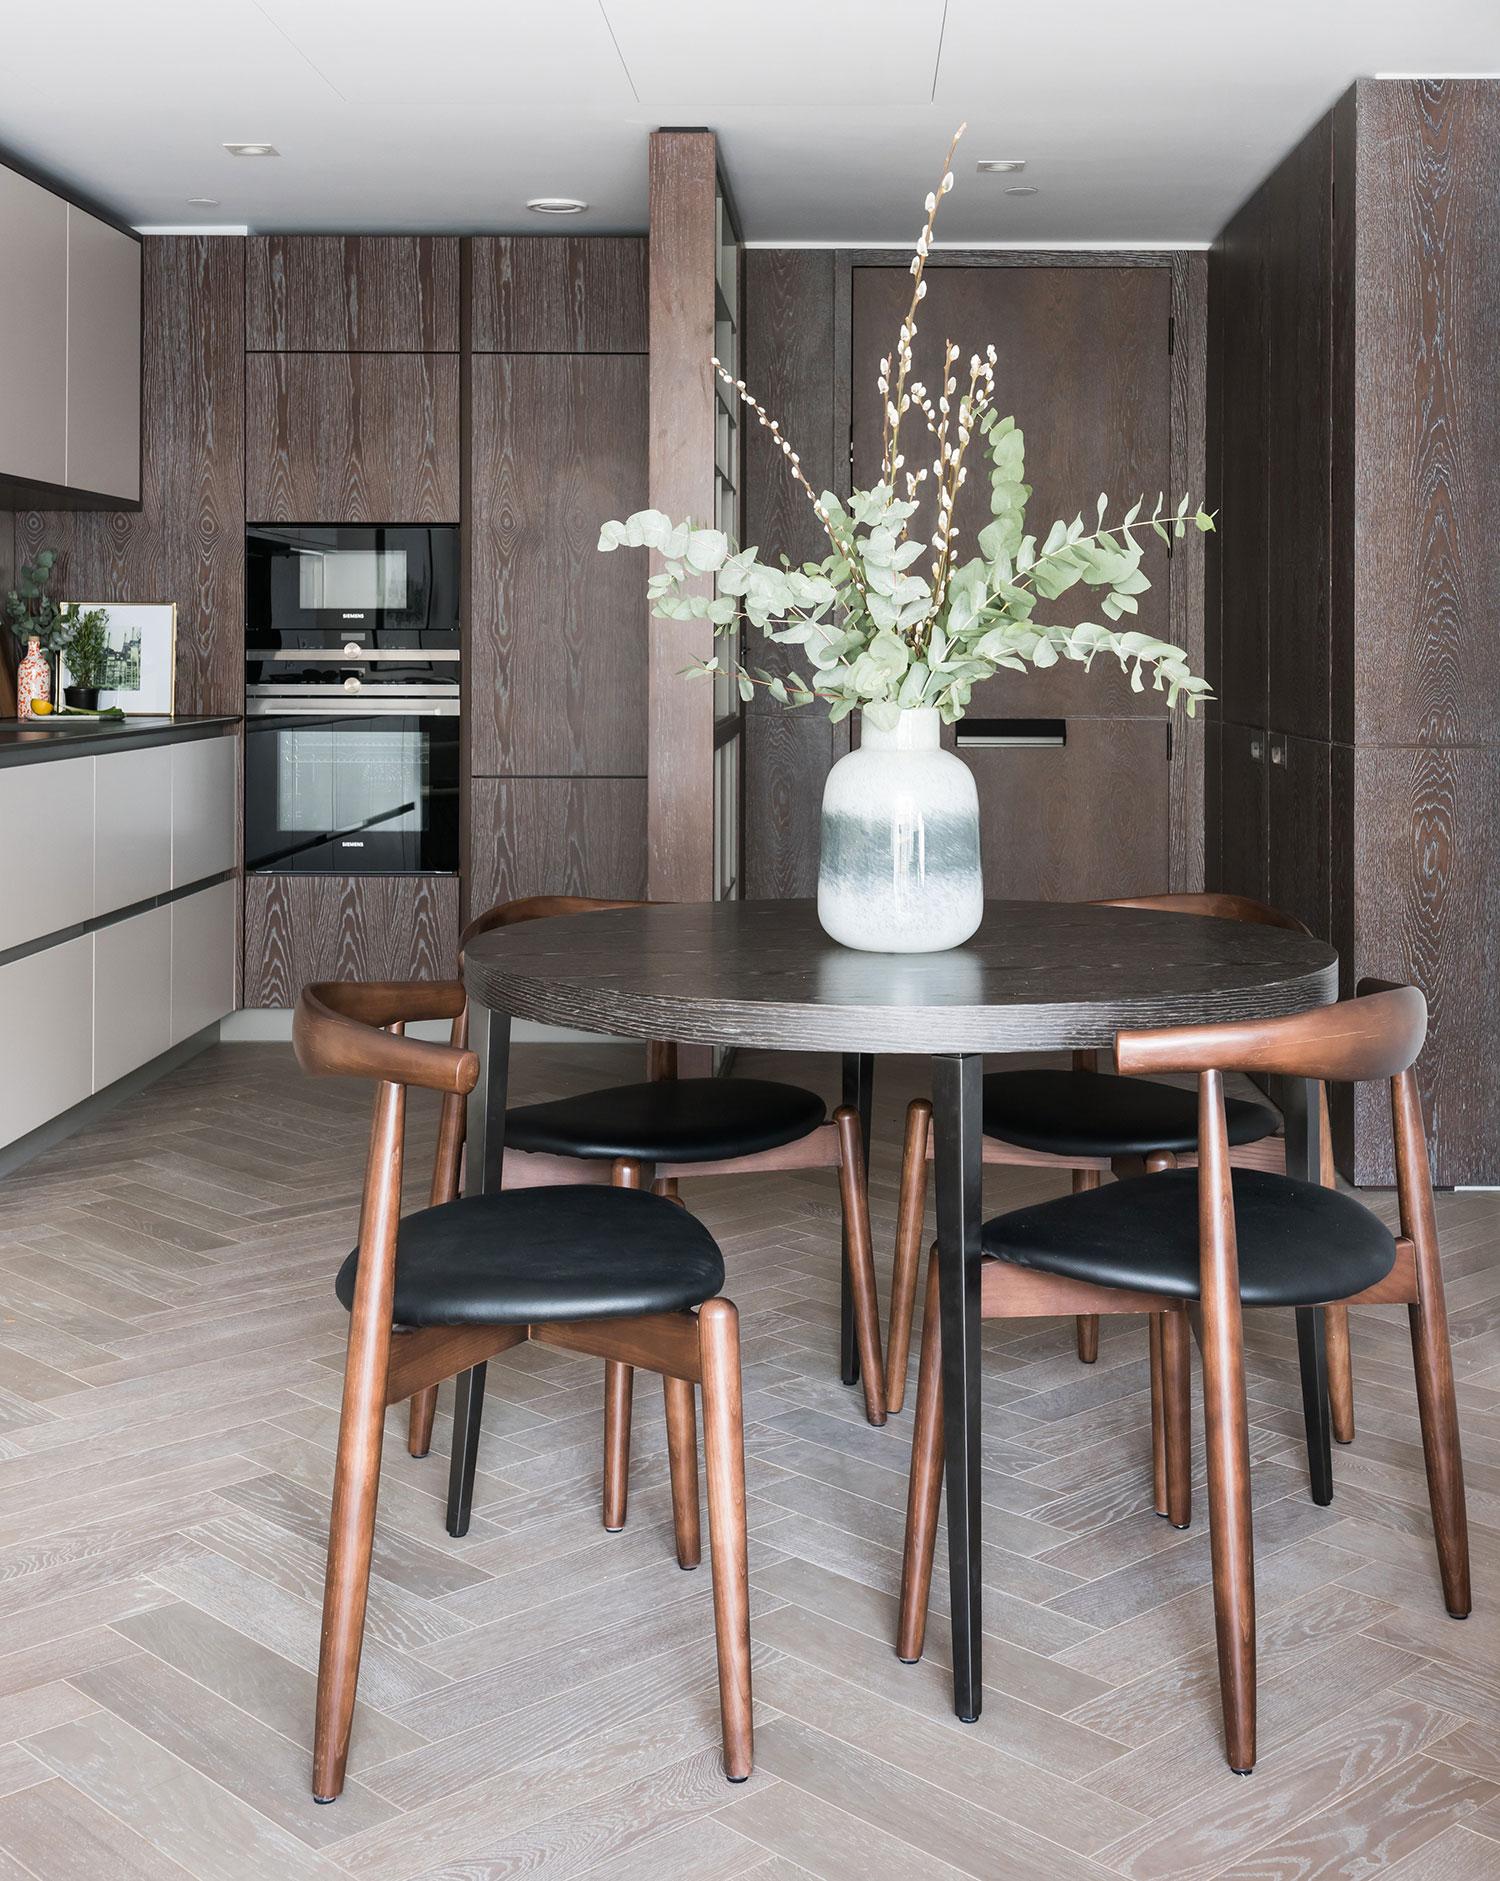 BoxNine7_Battersea_Power_Station_17_Kitchen_Dining_Room.jpg